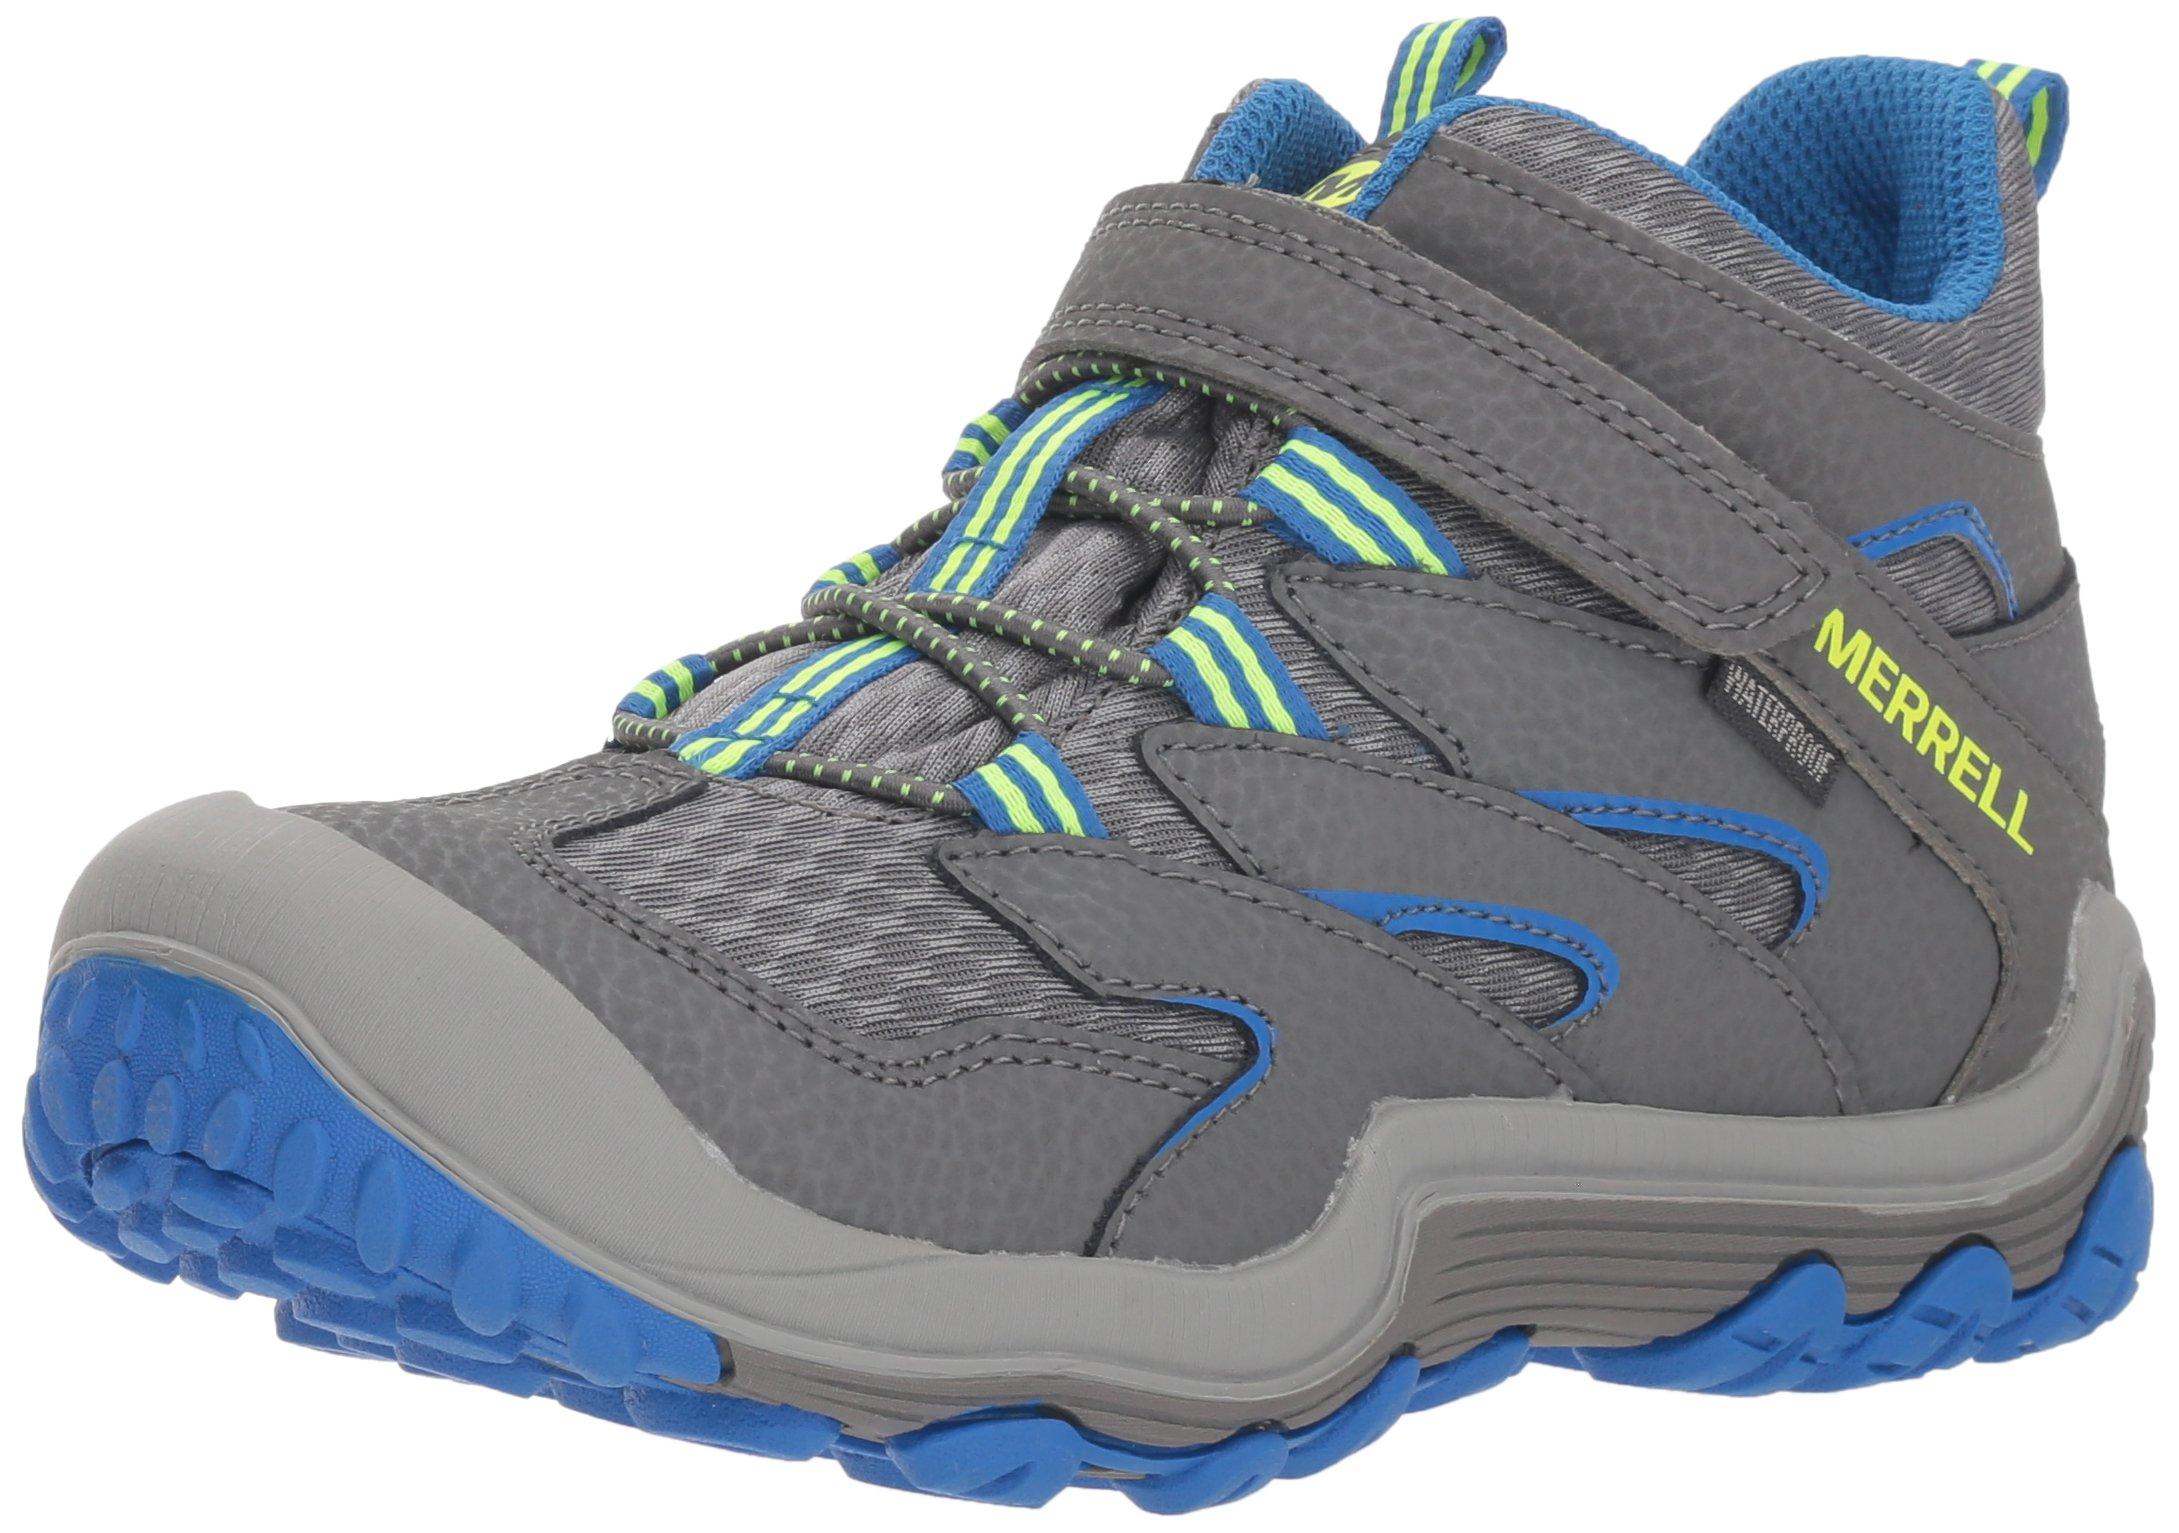 Merrell Boys' Chameleon 7 Access Mid A/C WTRPF Hiking Shoe, Grey/Blue, 3 Medium US Little Kid